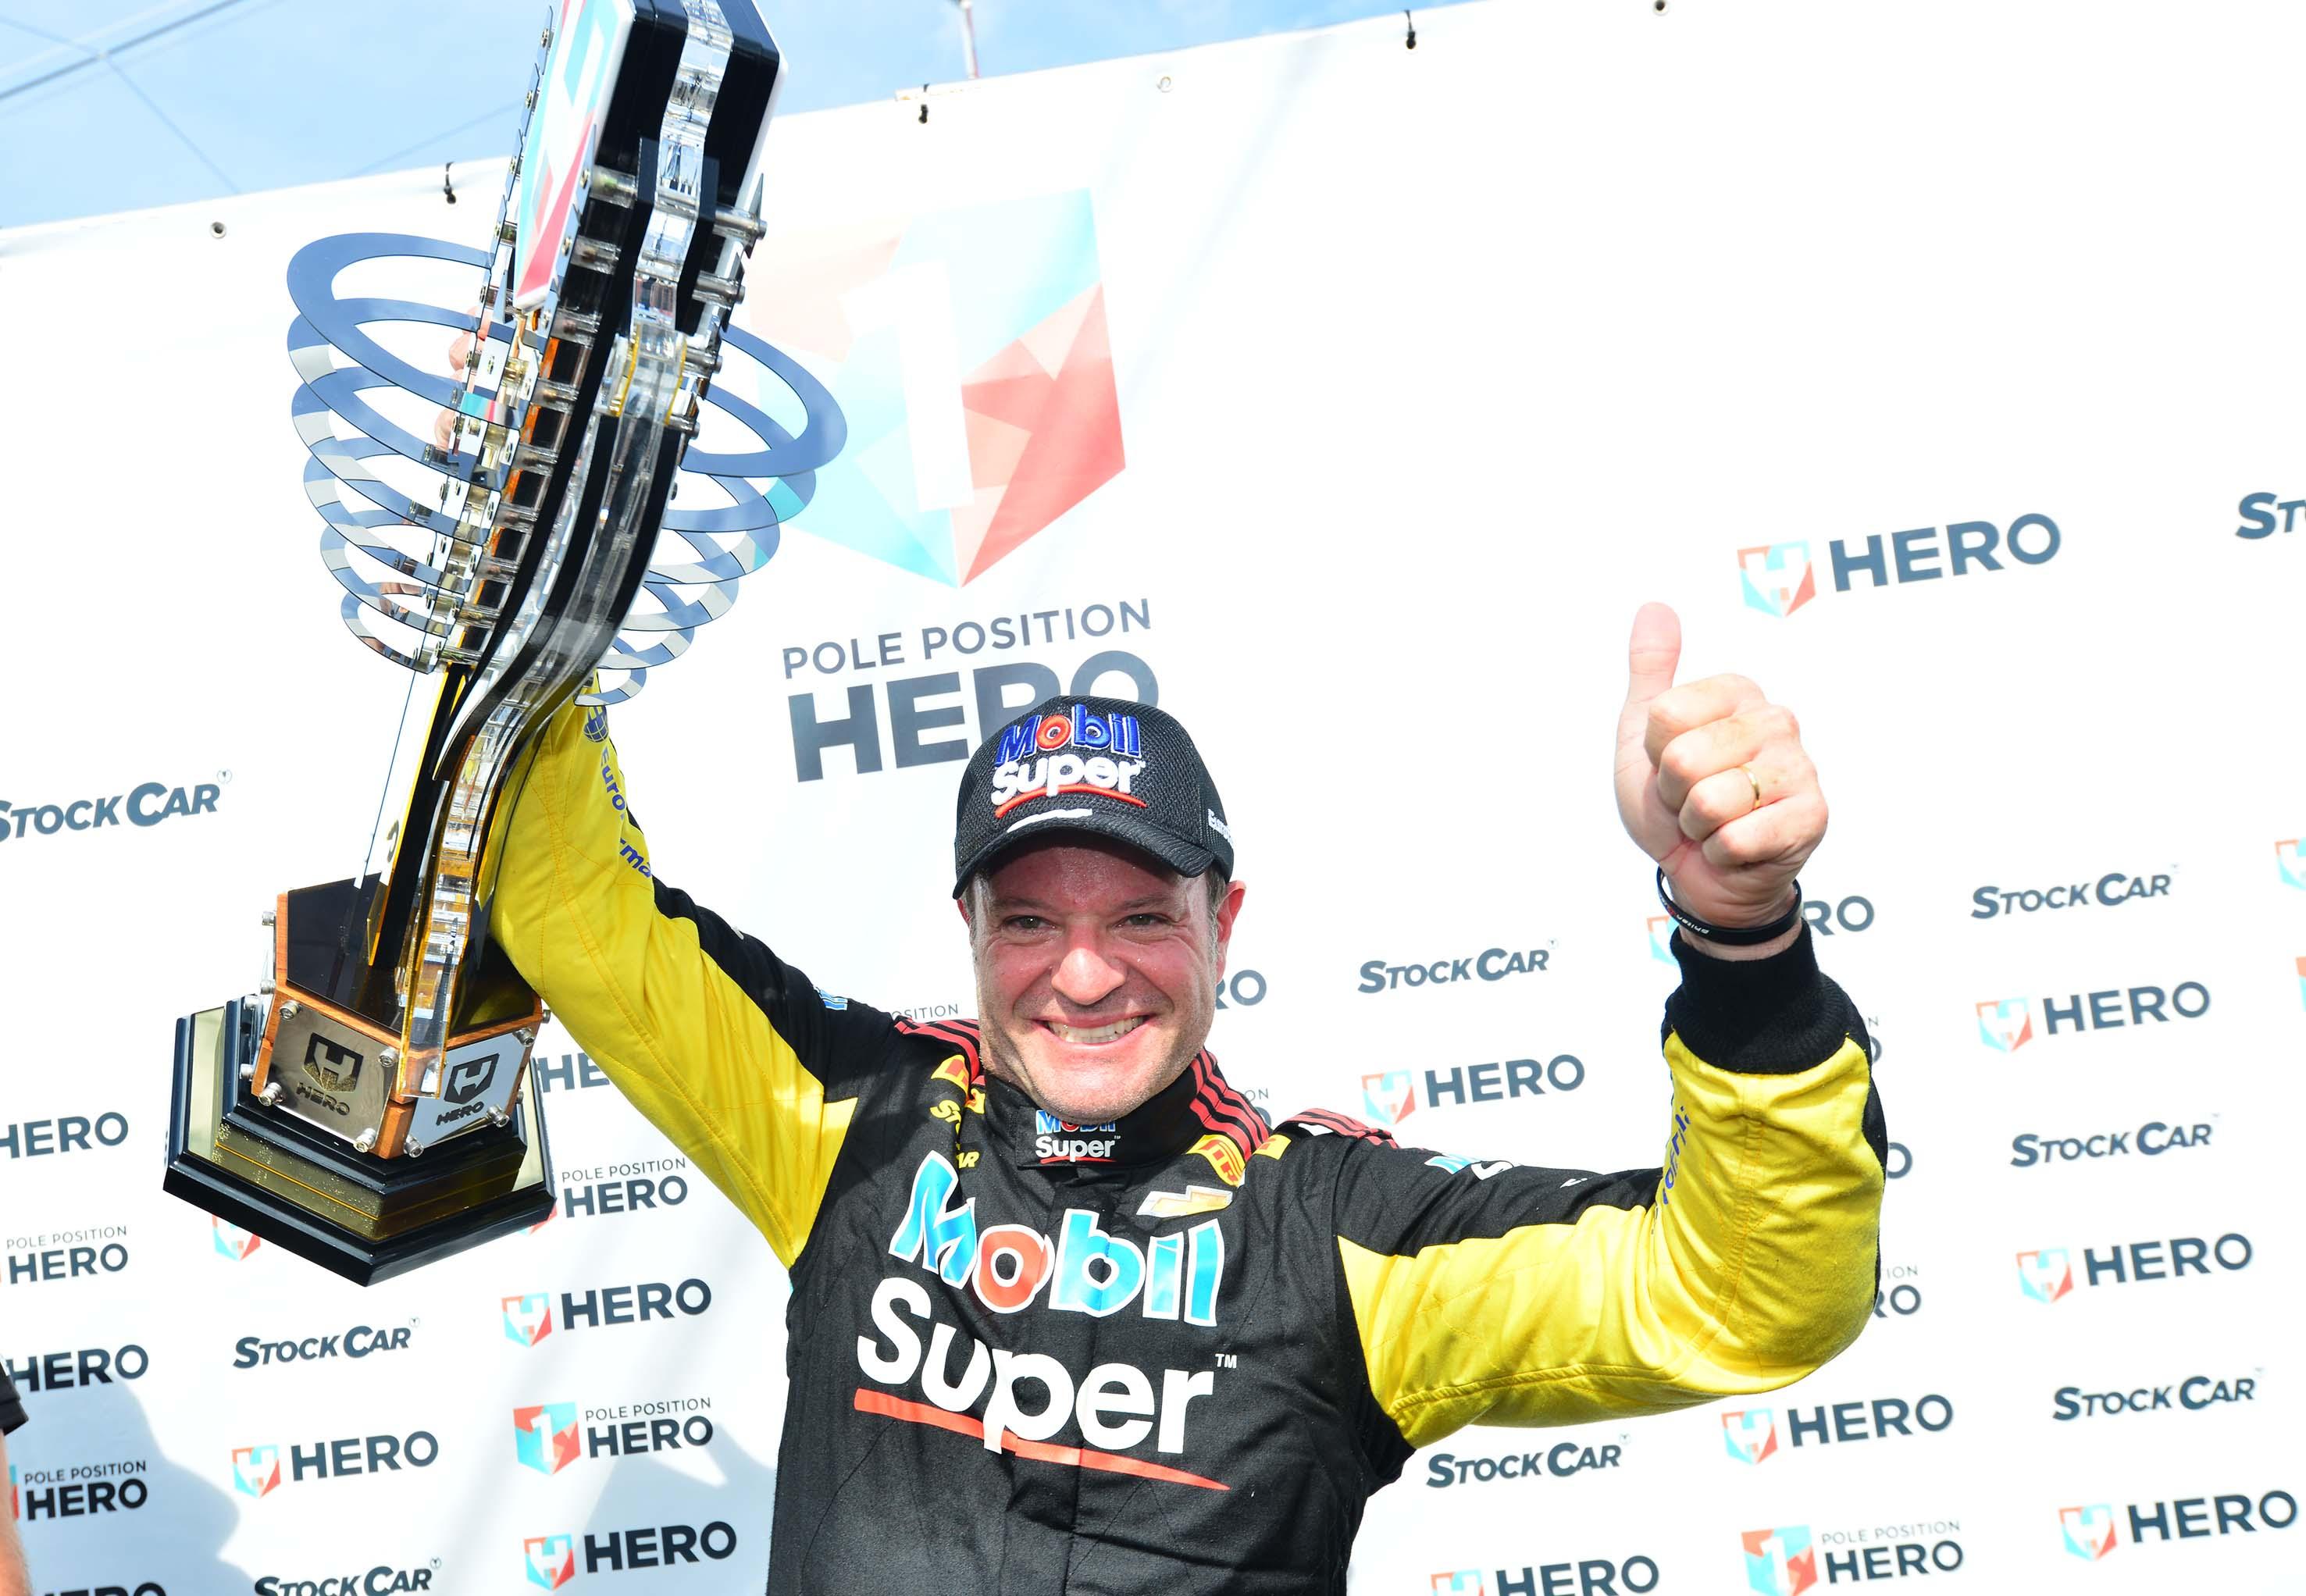 Photo of Stock Car – Barrichello brilha novamente ao conquistar a pole position em Londrina